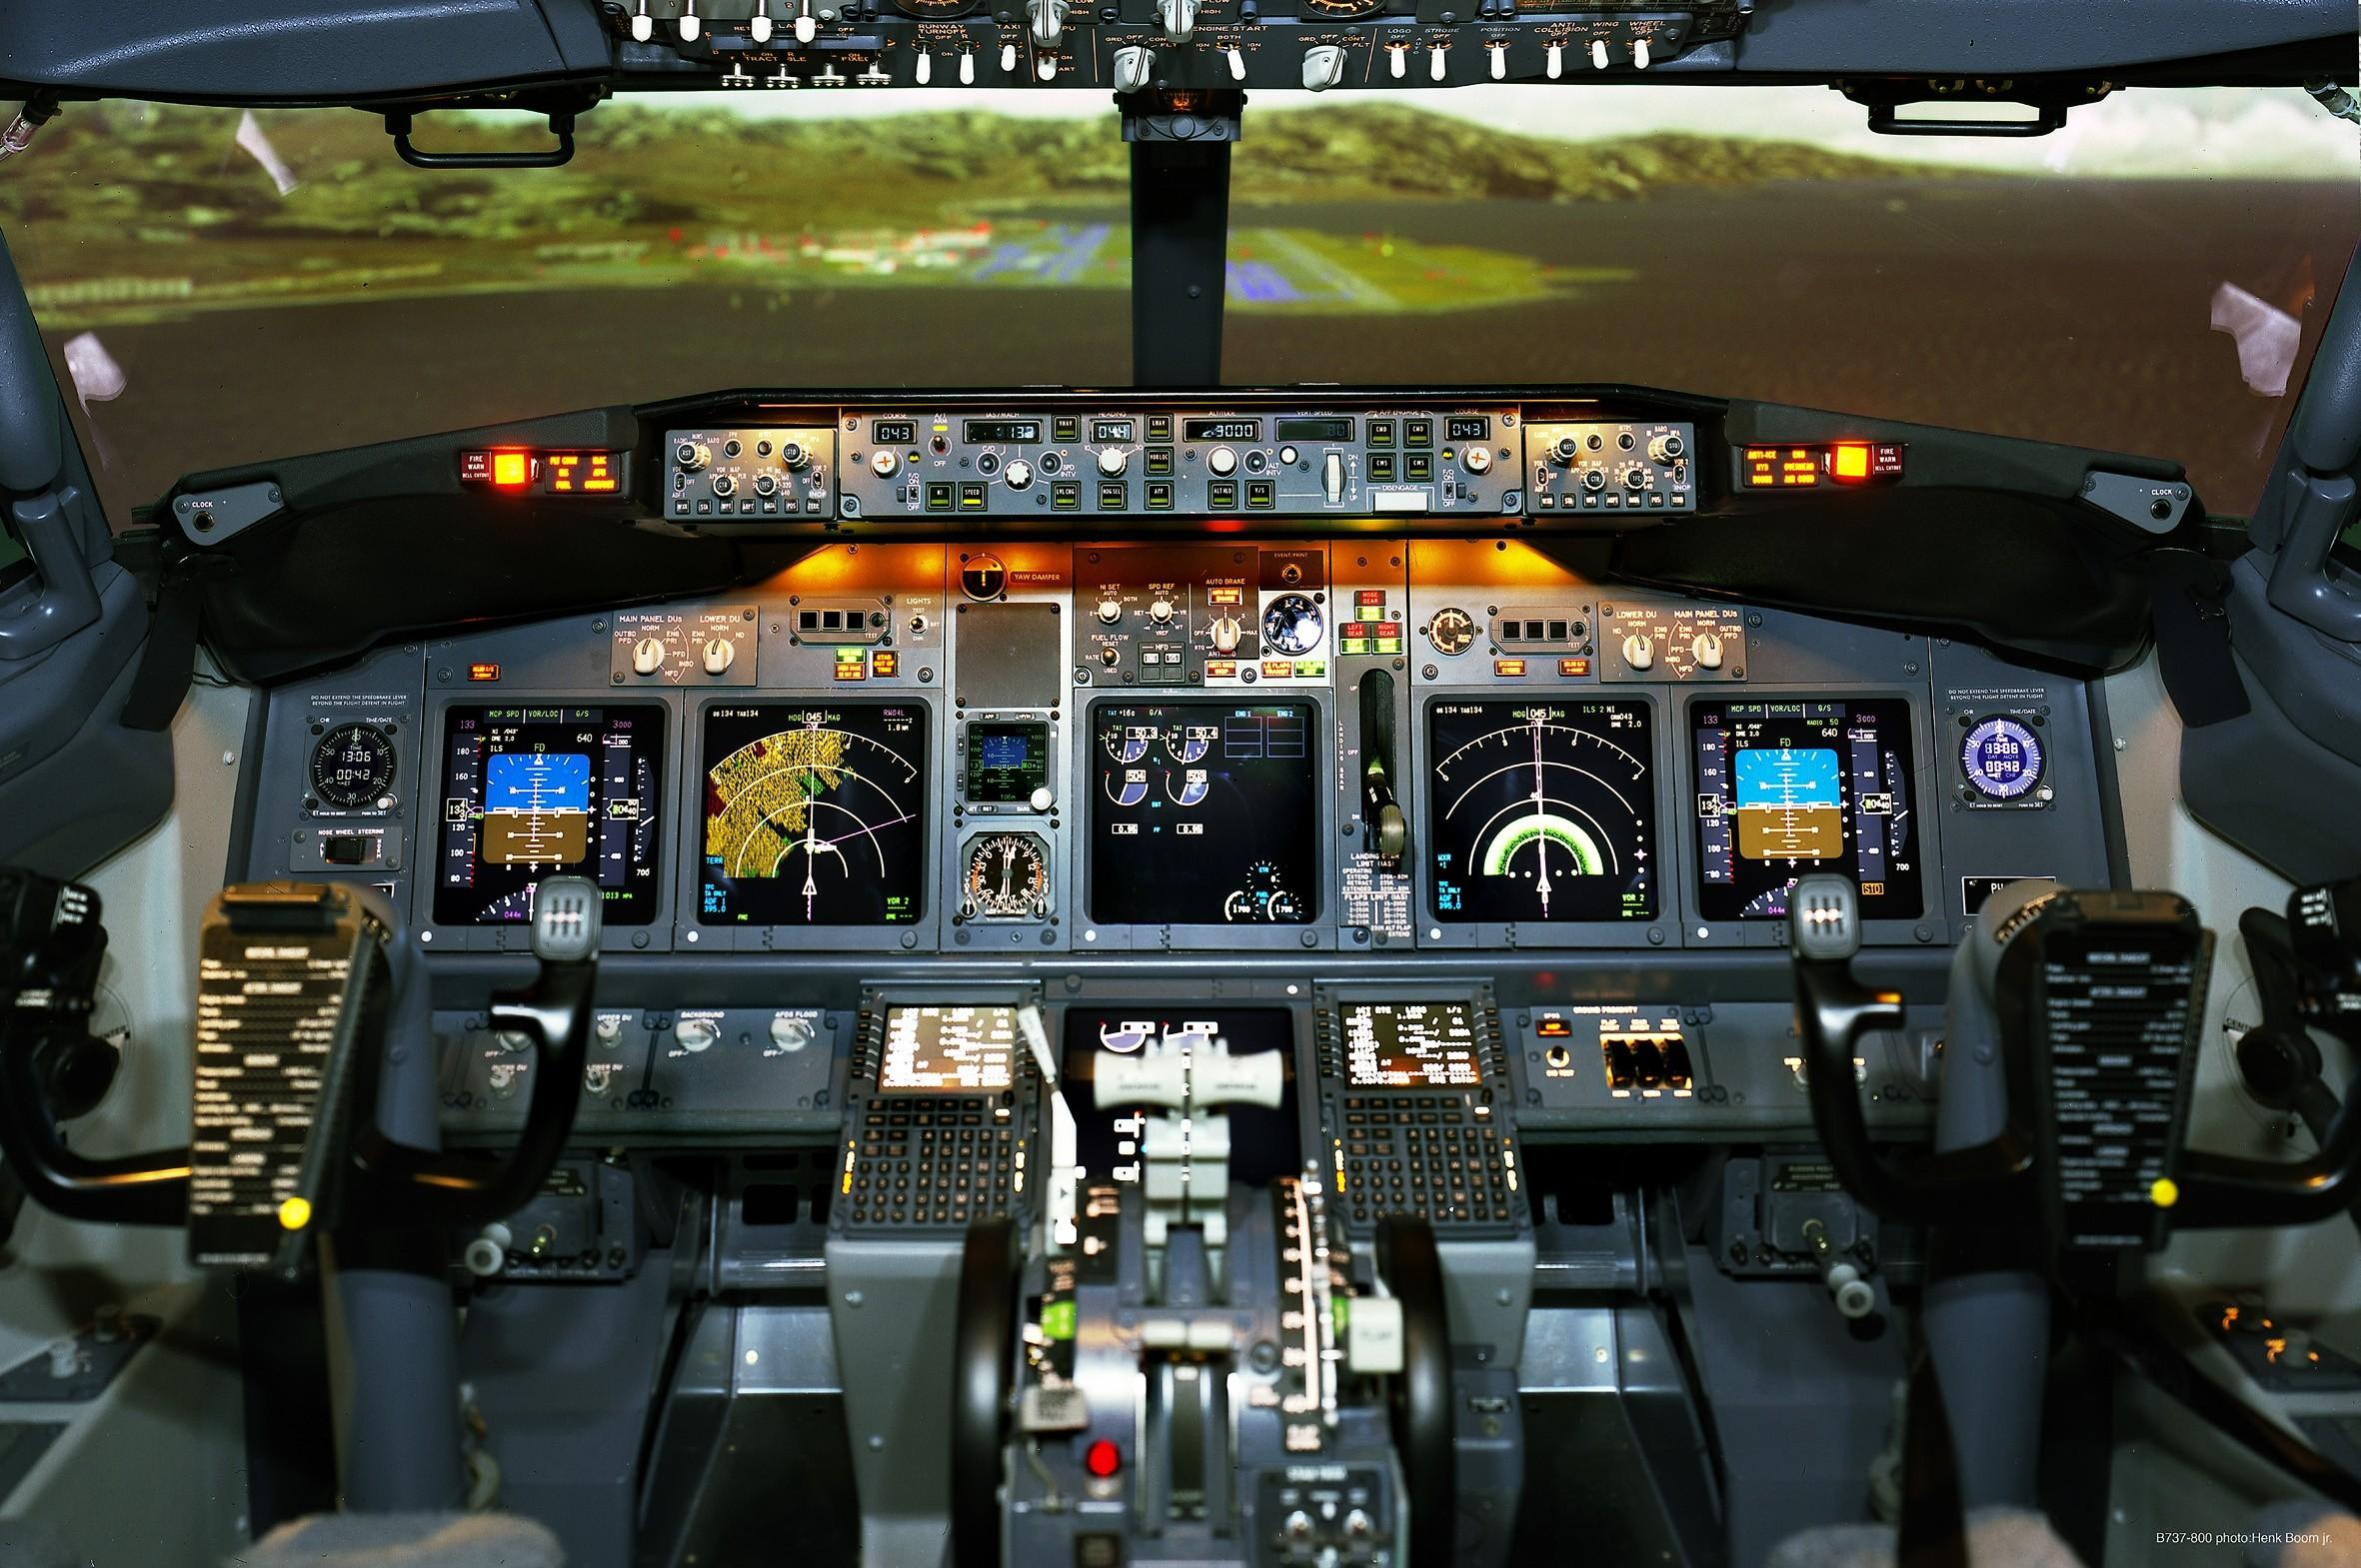 Filename: cockpit-simumator.jpg